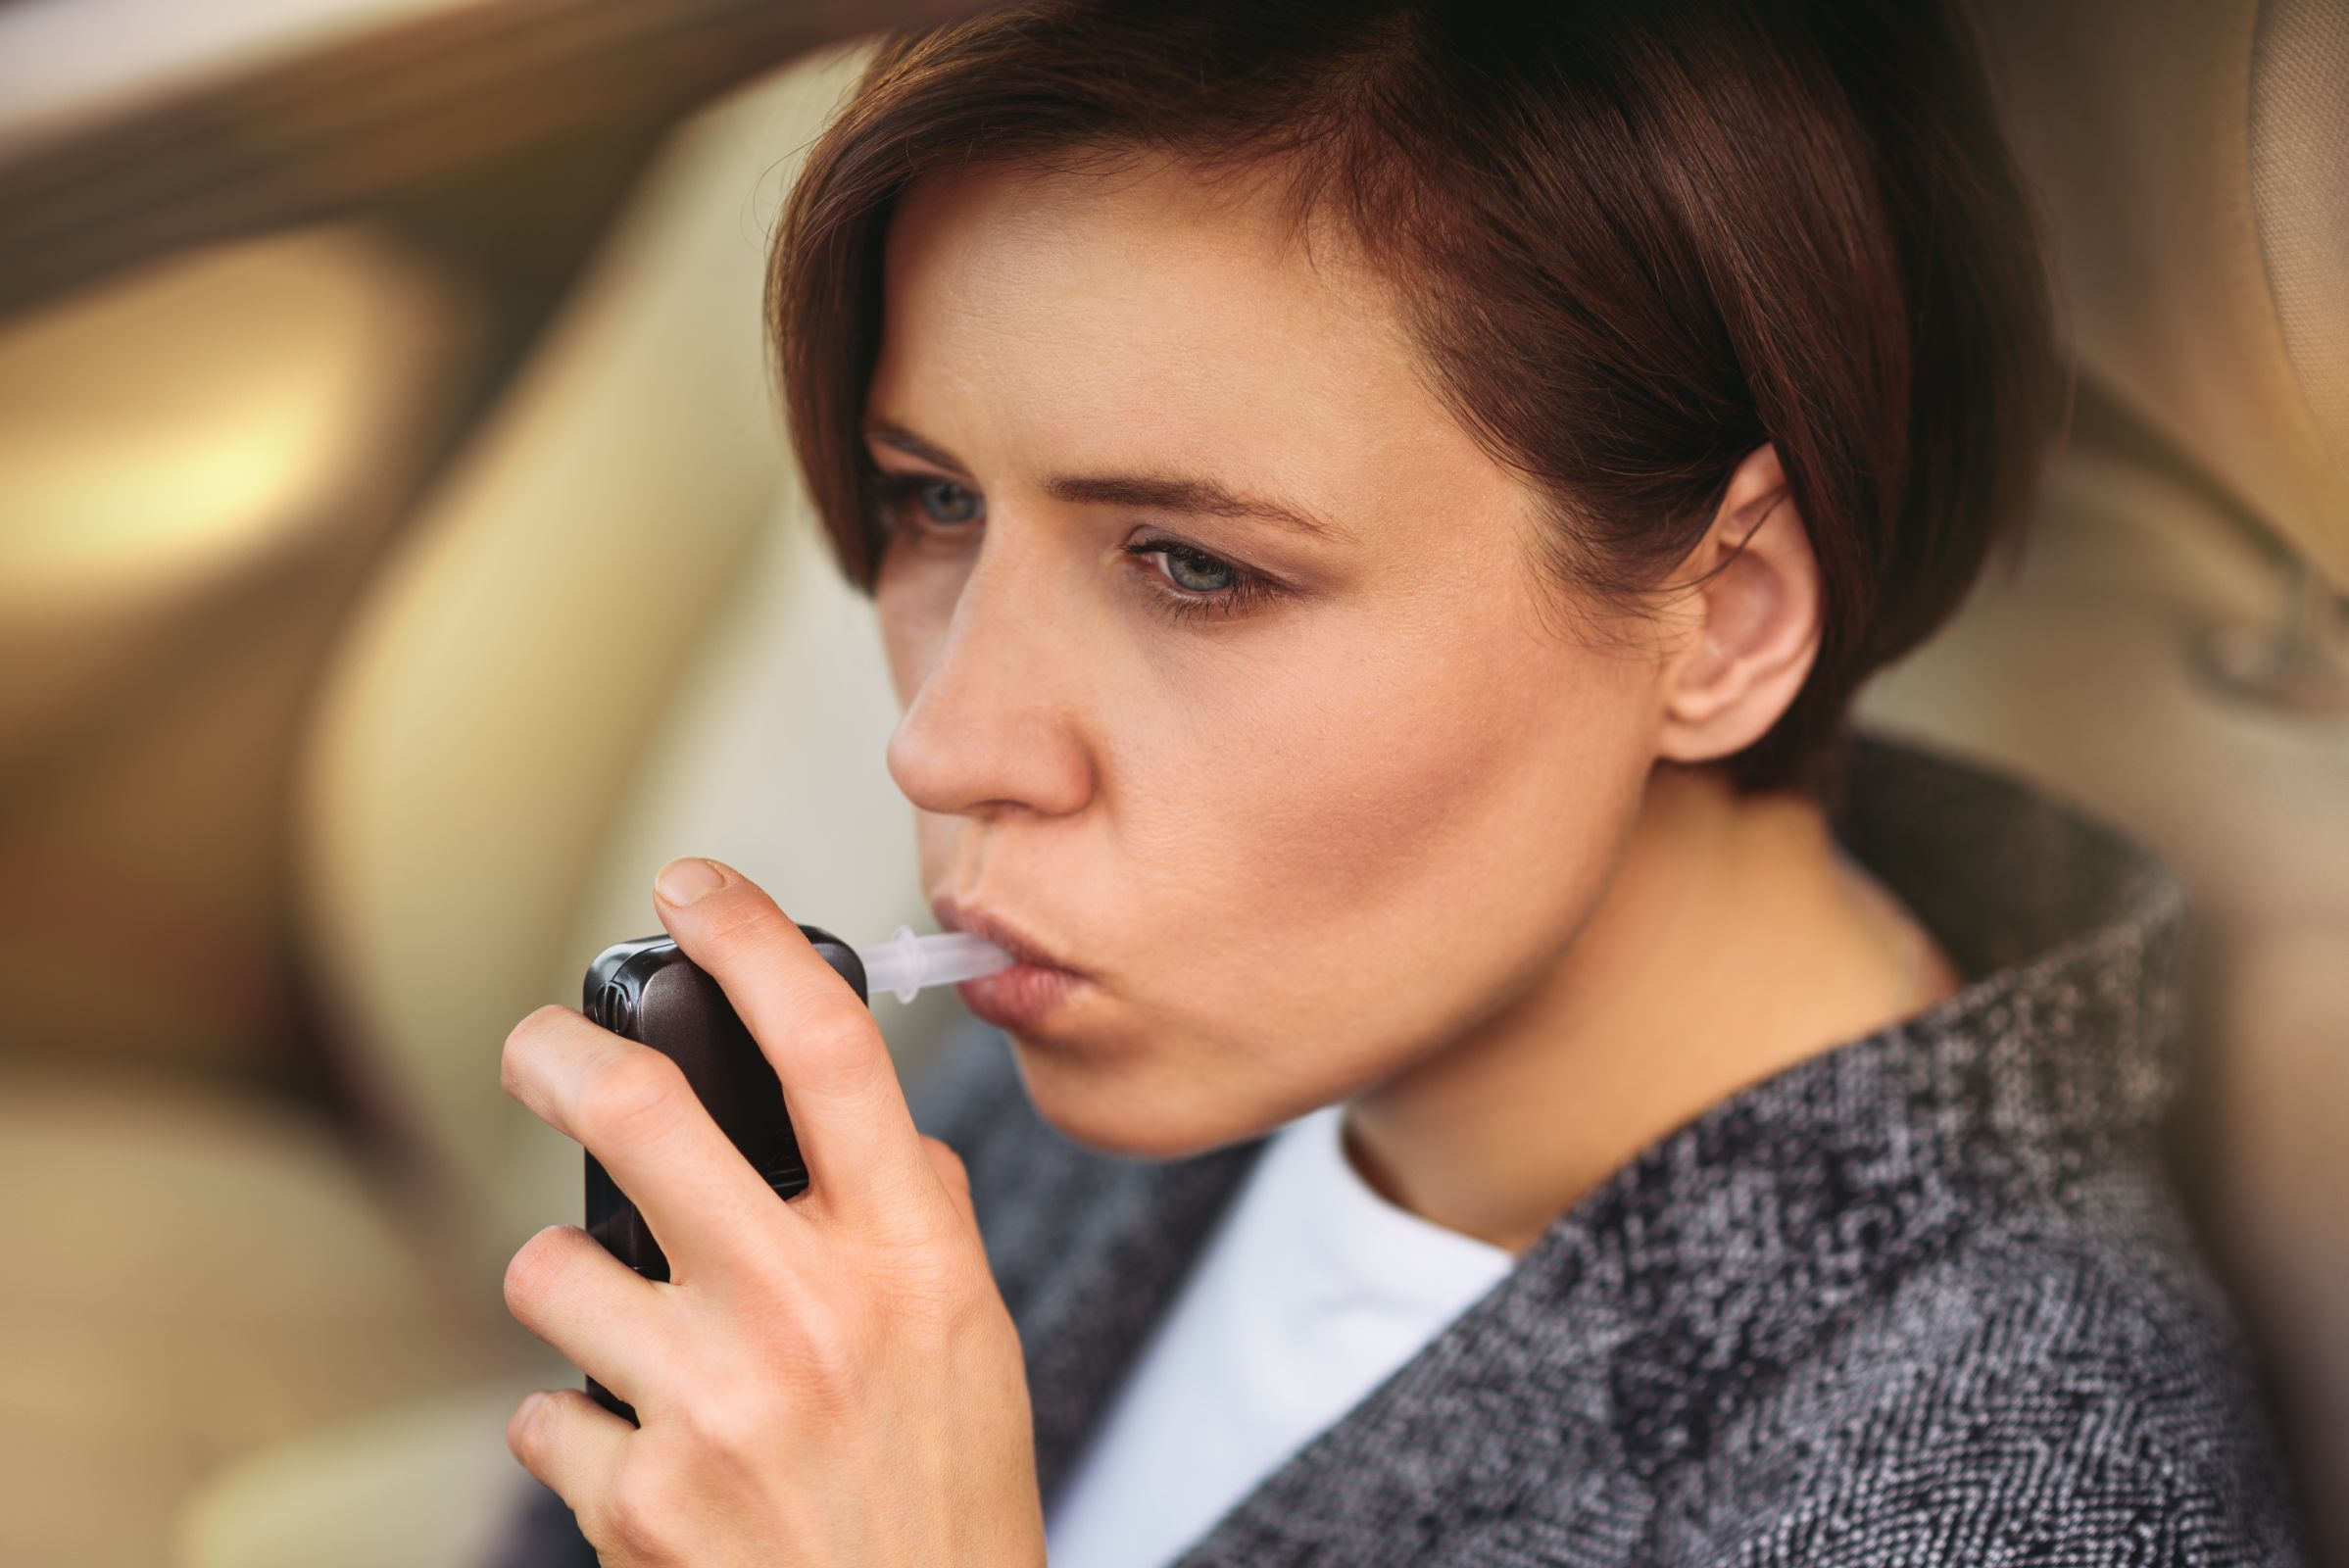 shutterstock bafometro drogometro lei seca alcool drogas